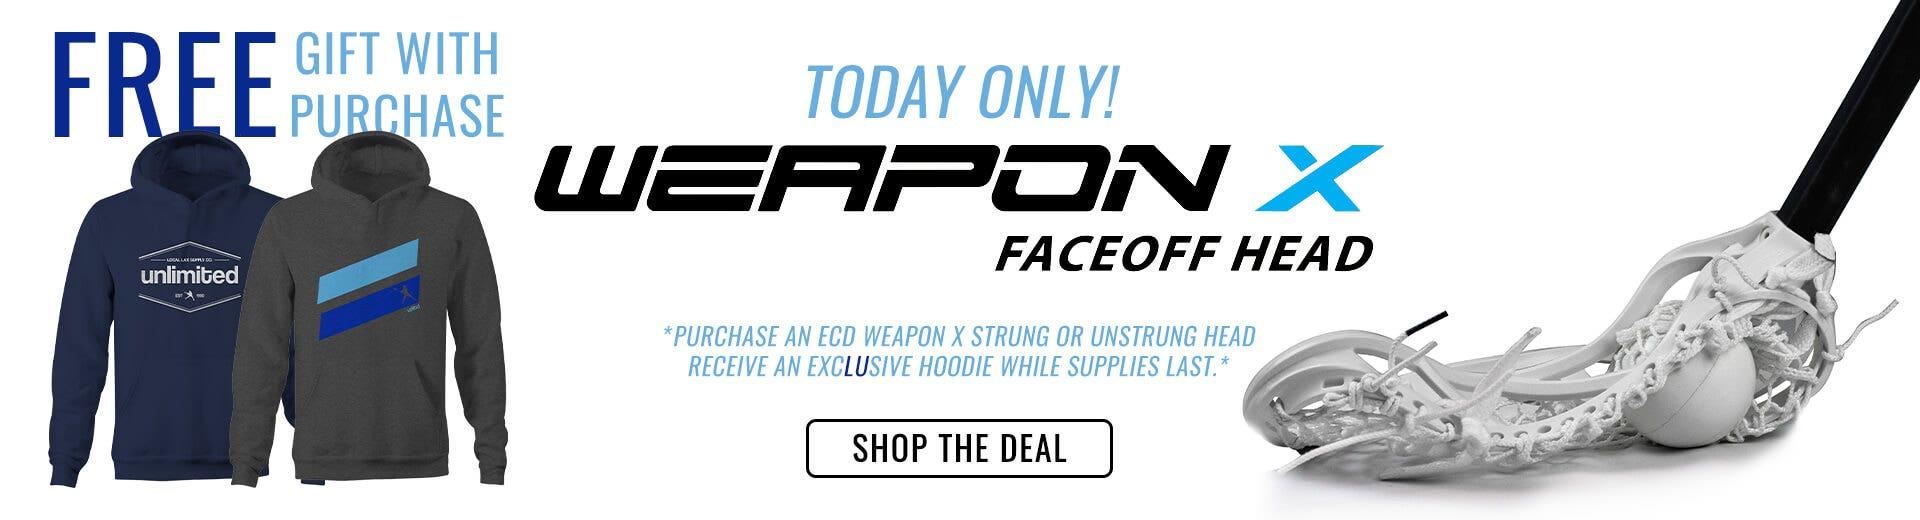 ECD Weapon X - DESKTOP